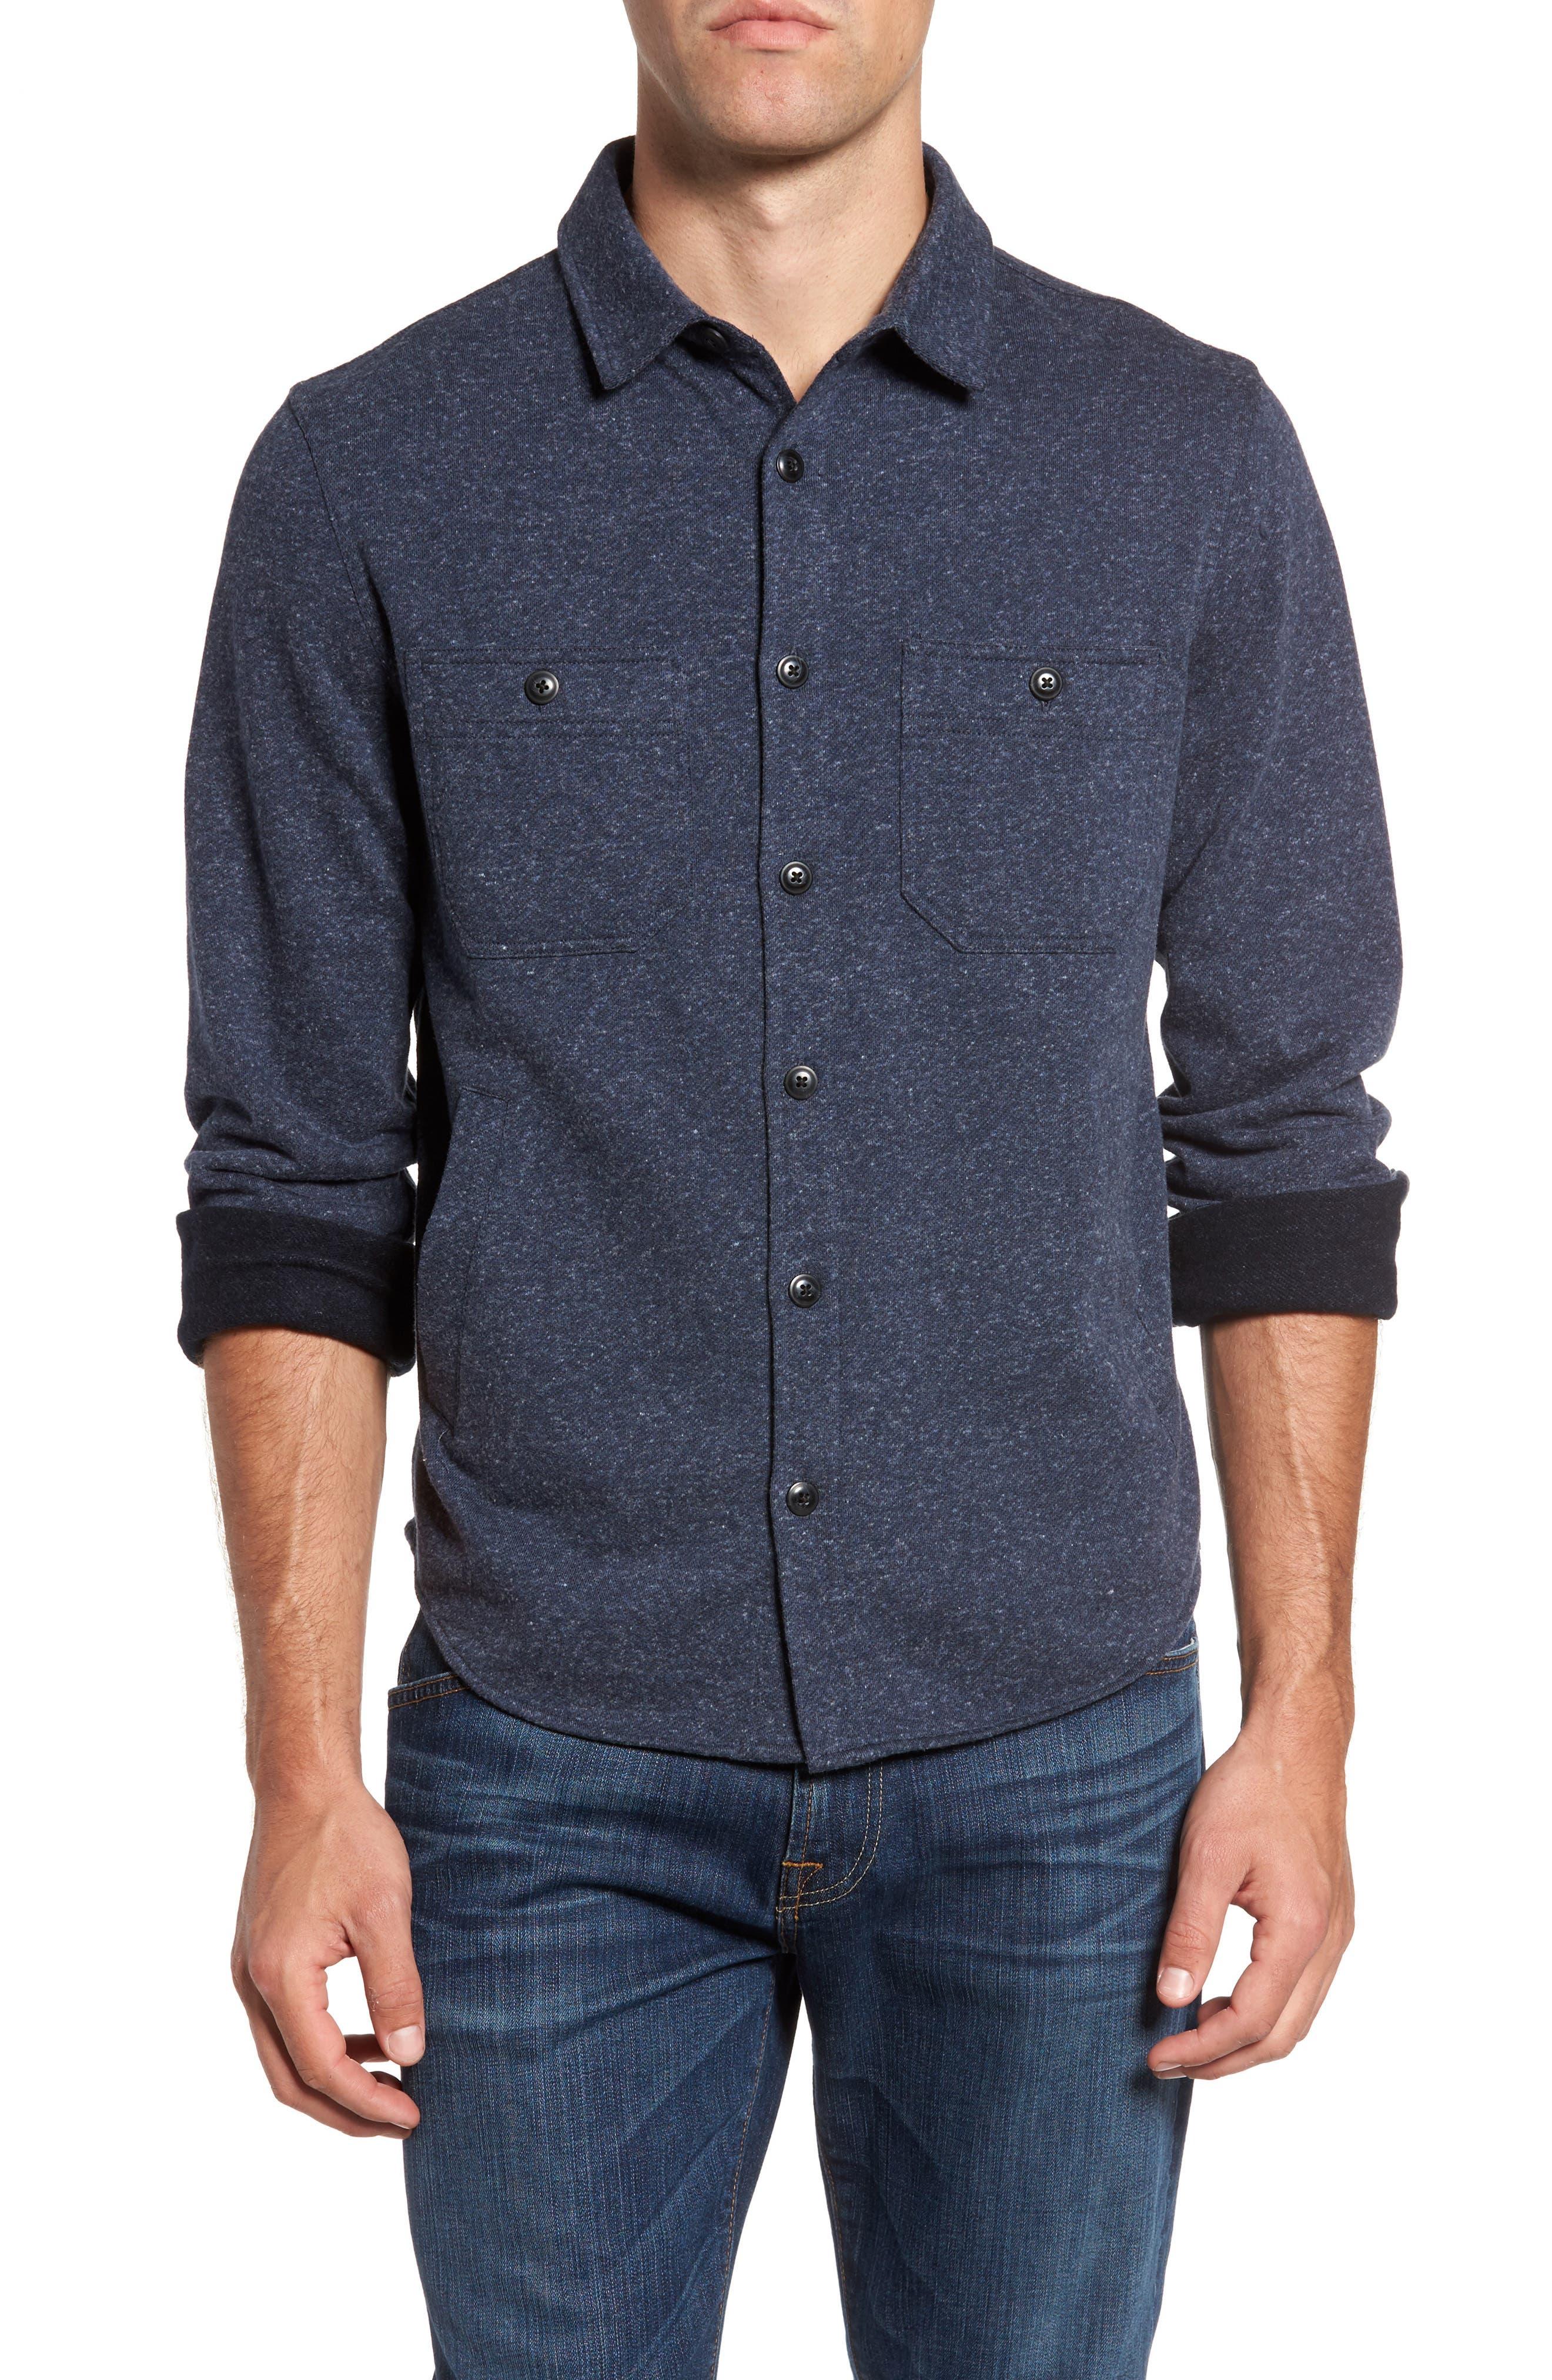 Main Image - Grayers Bayswater Modern Fit Heathered Shirt Jacket